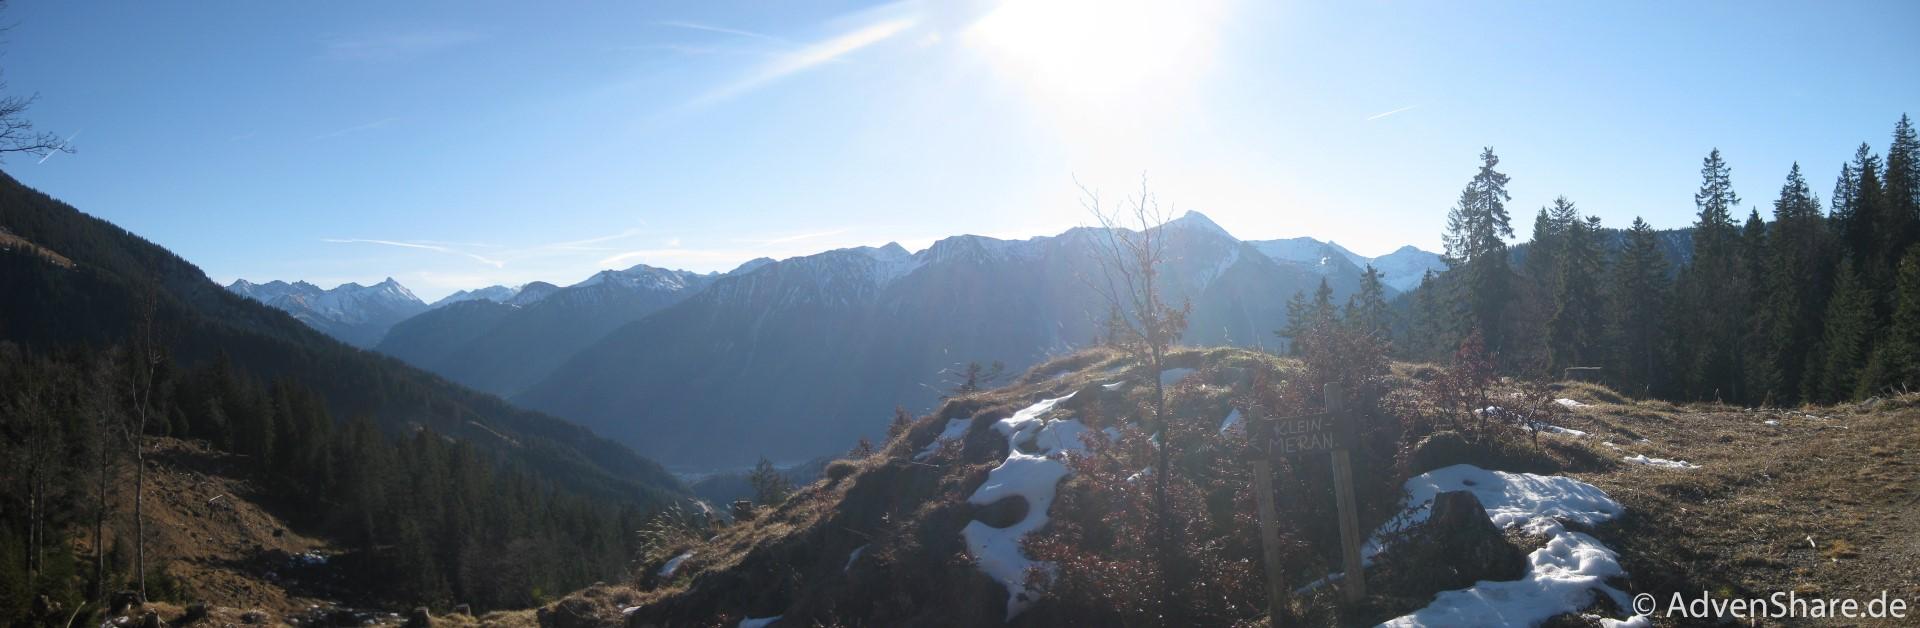 01_Krinnenspitze (Large)